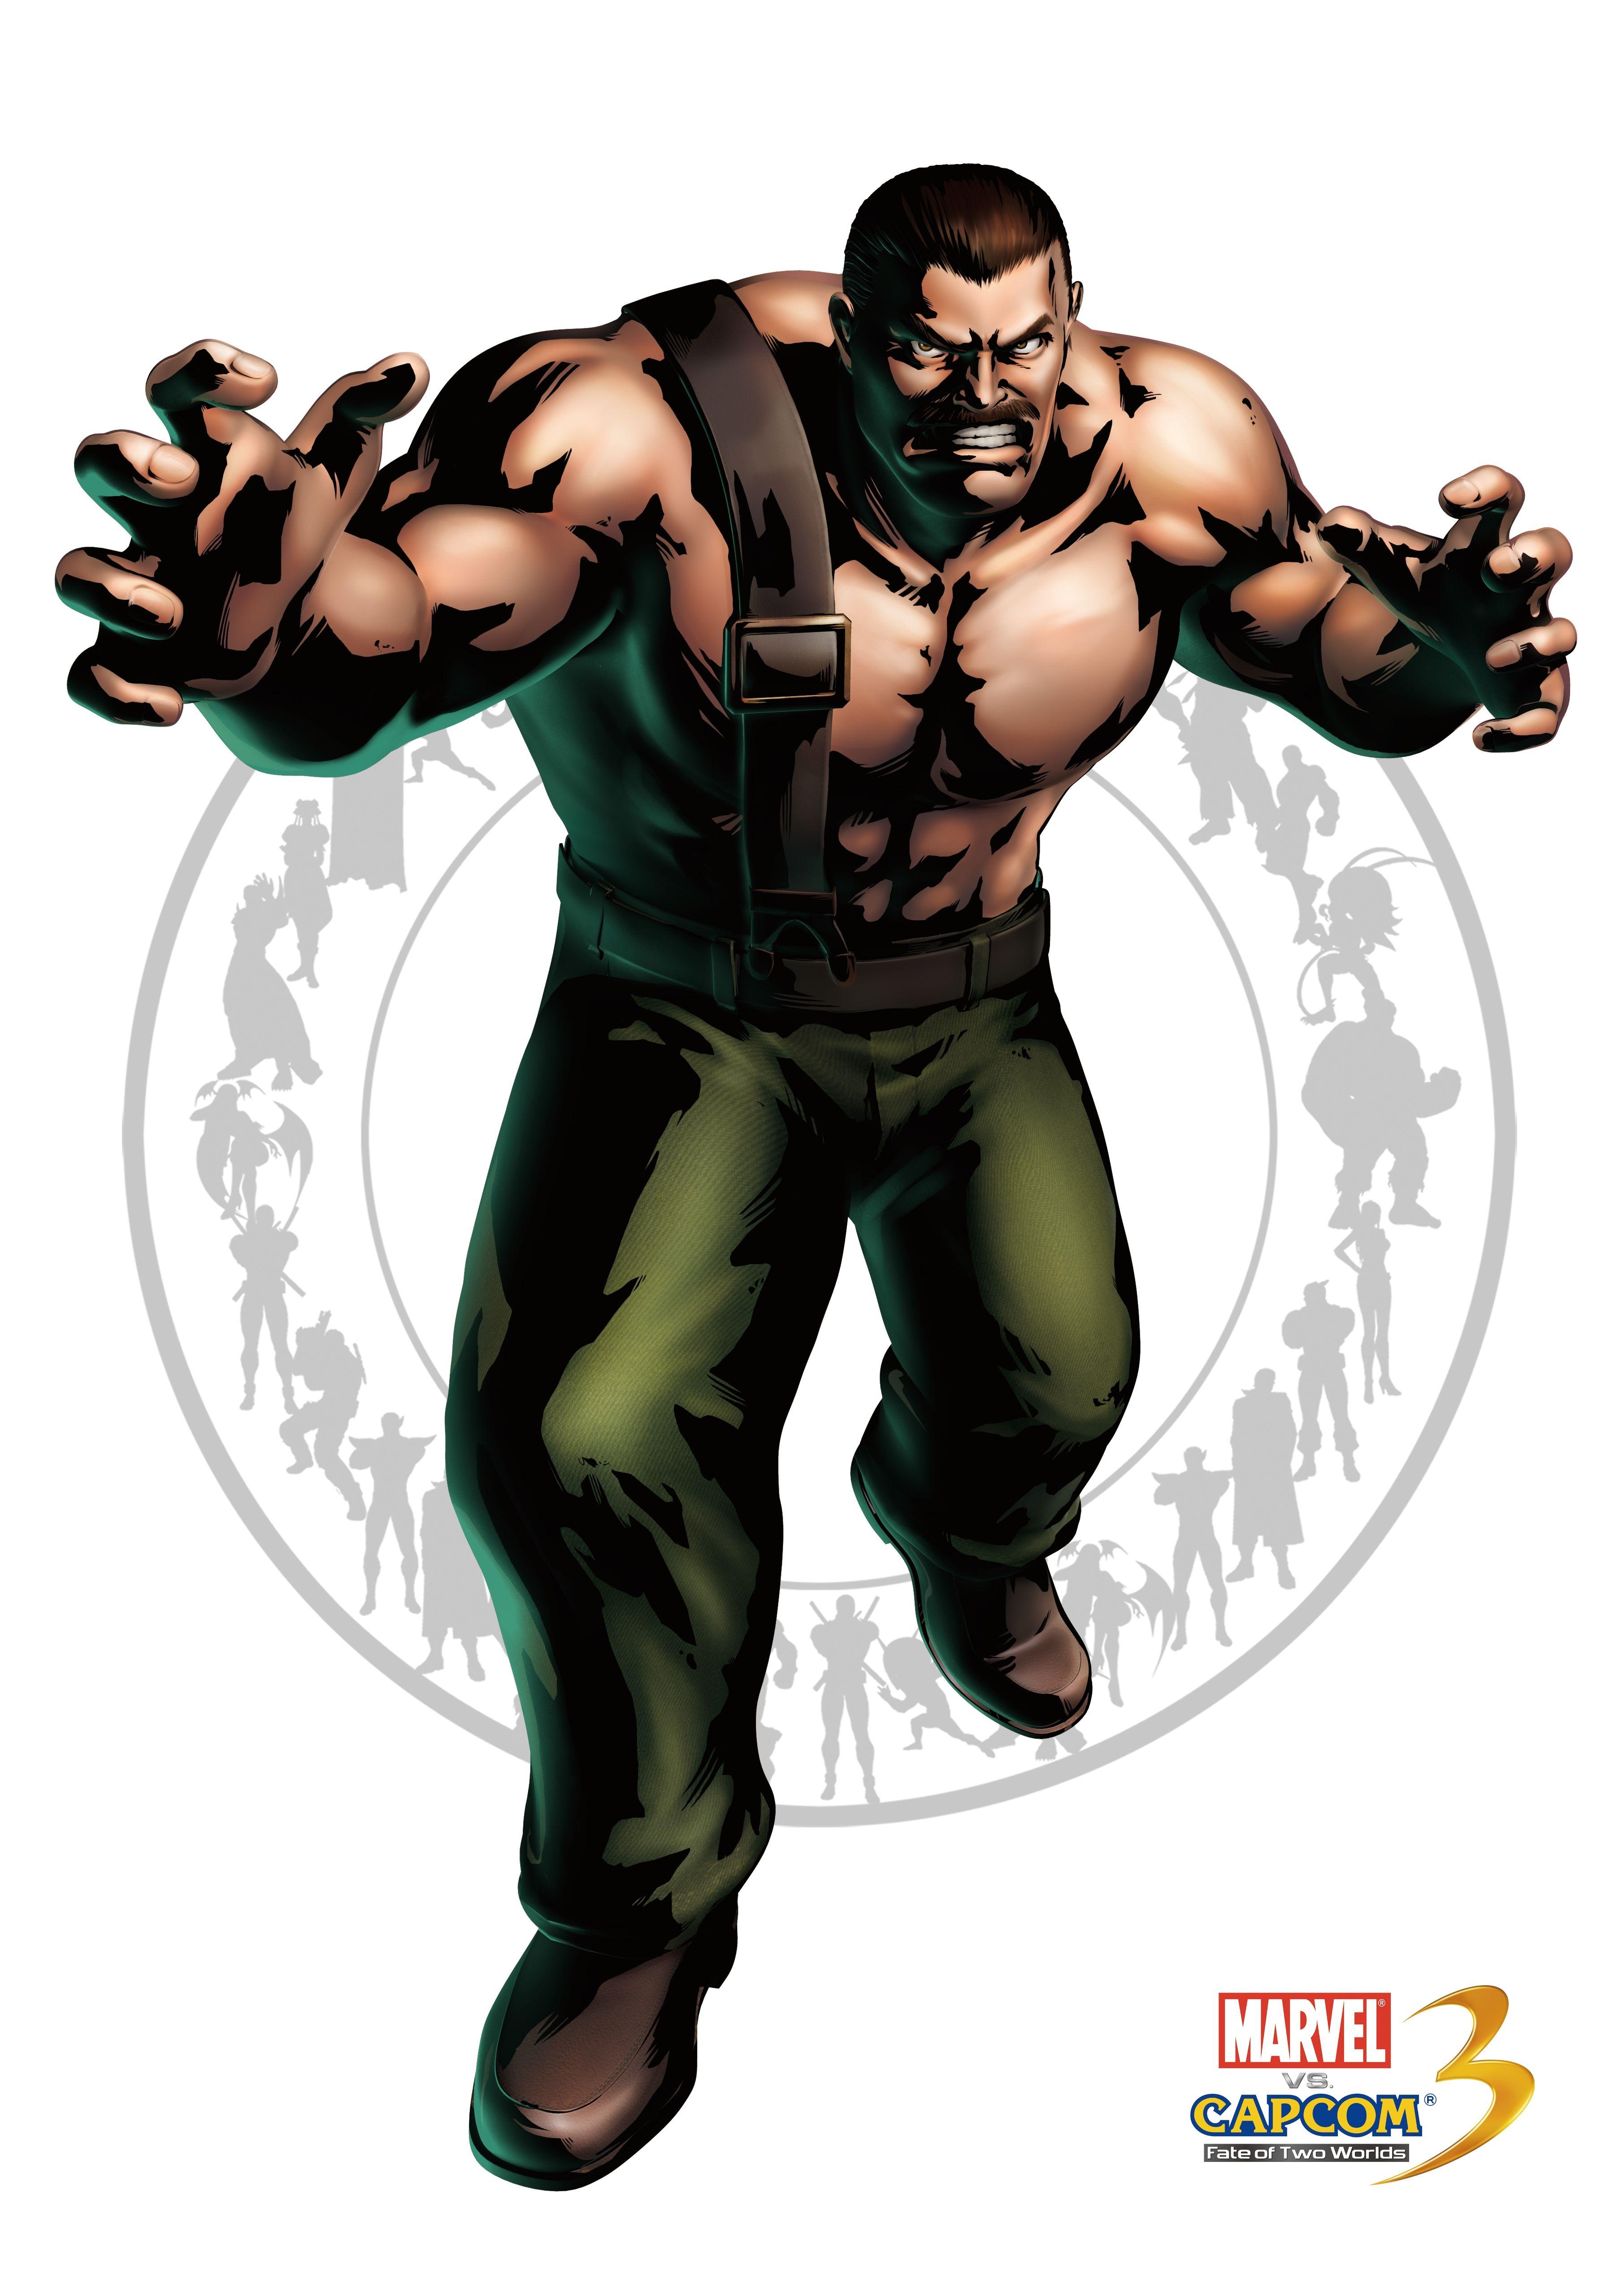 Майк Хаггар - Marvel vs. Capcom 3: Fate of Two Worlds Арт, Персонаж